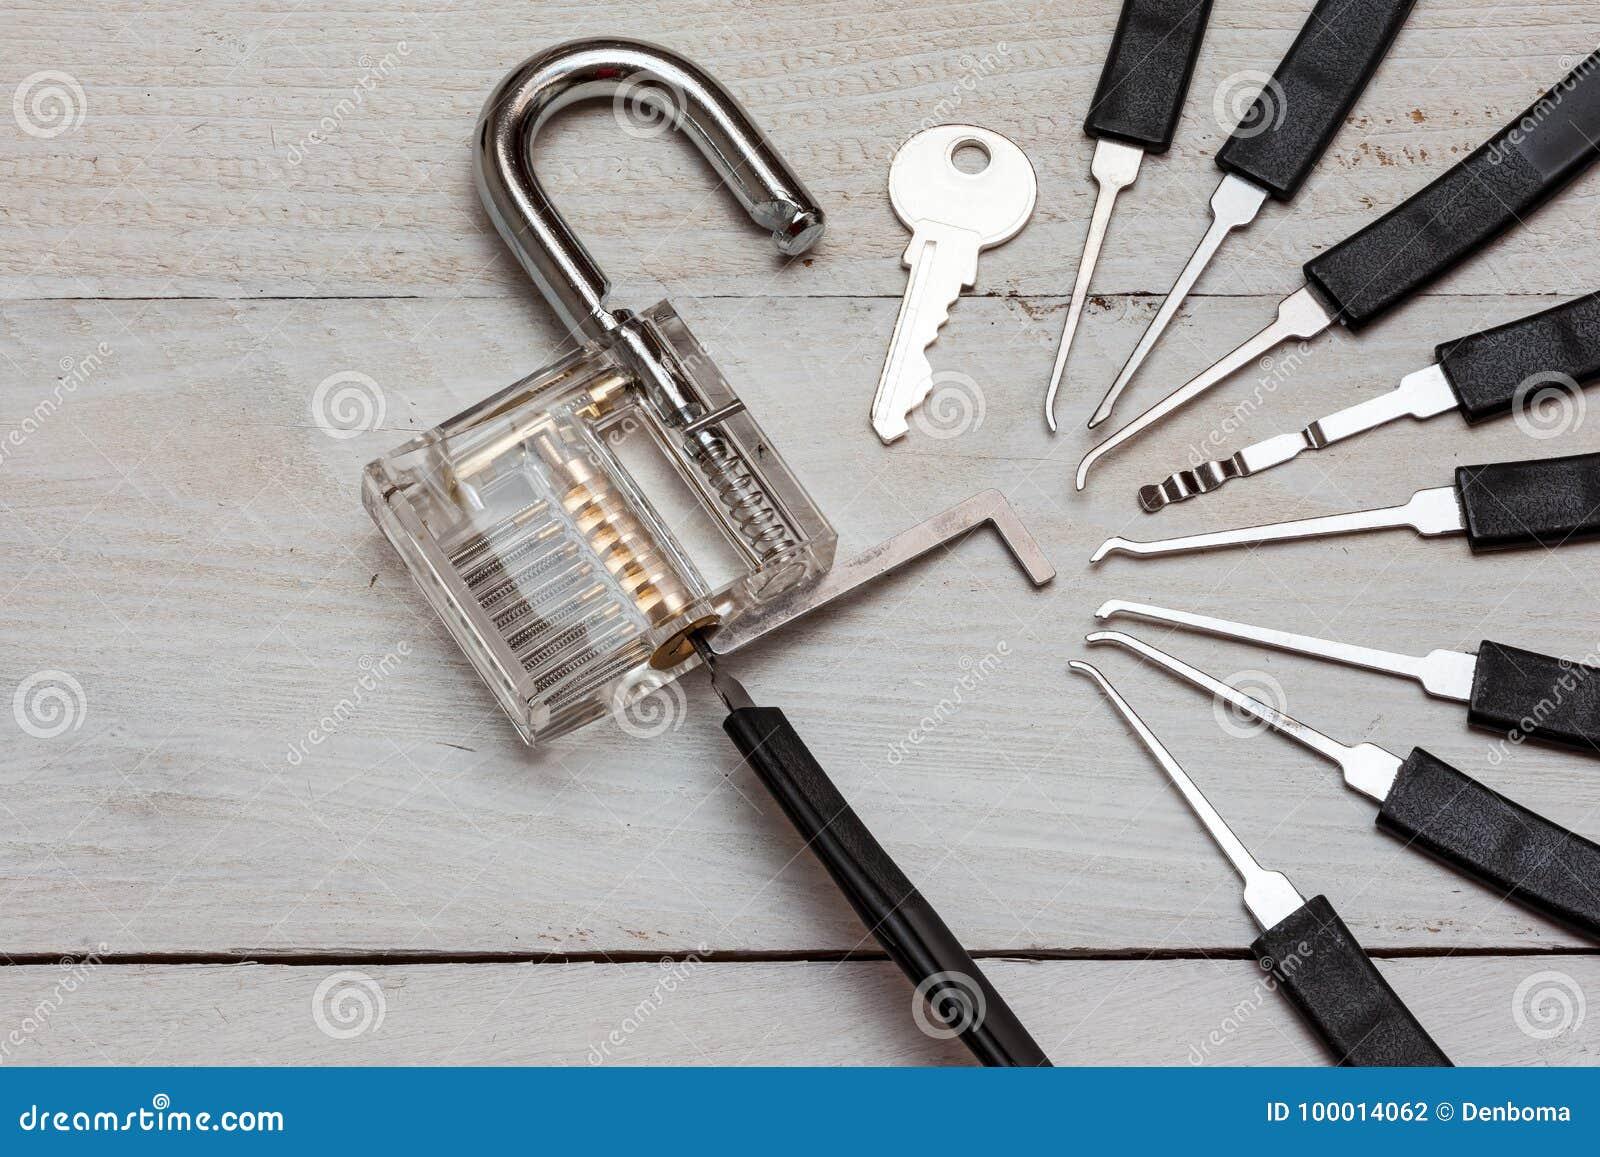 An lock pick stock photo  Image of tool, lockpick, unlock